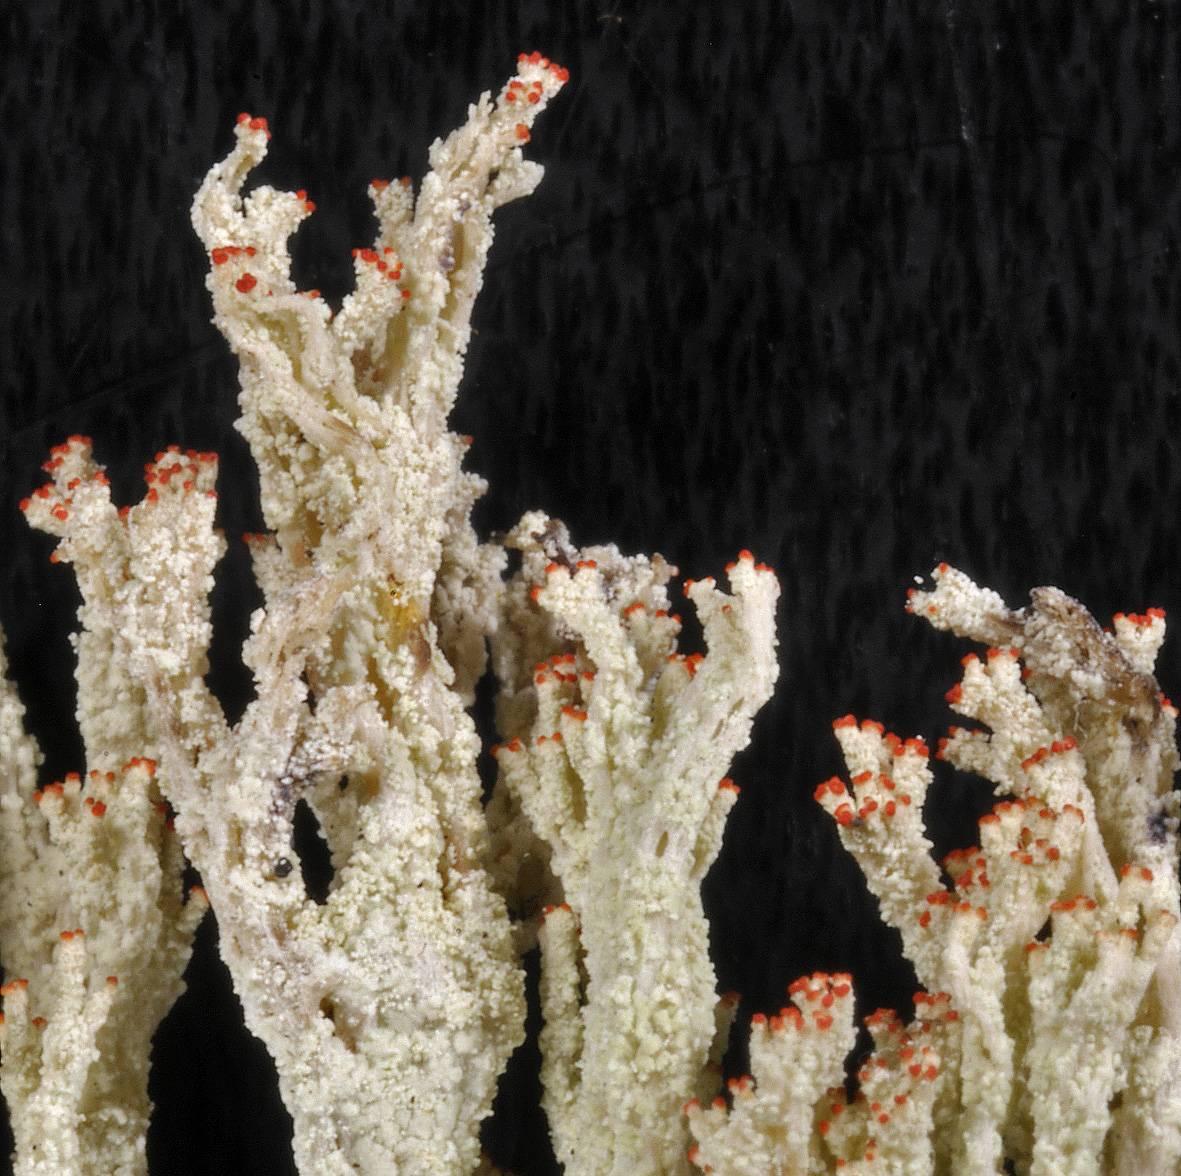 Cladonia bungartzii